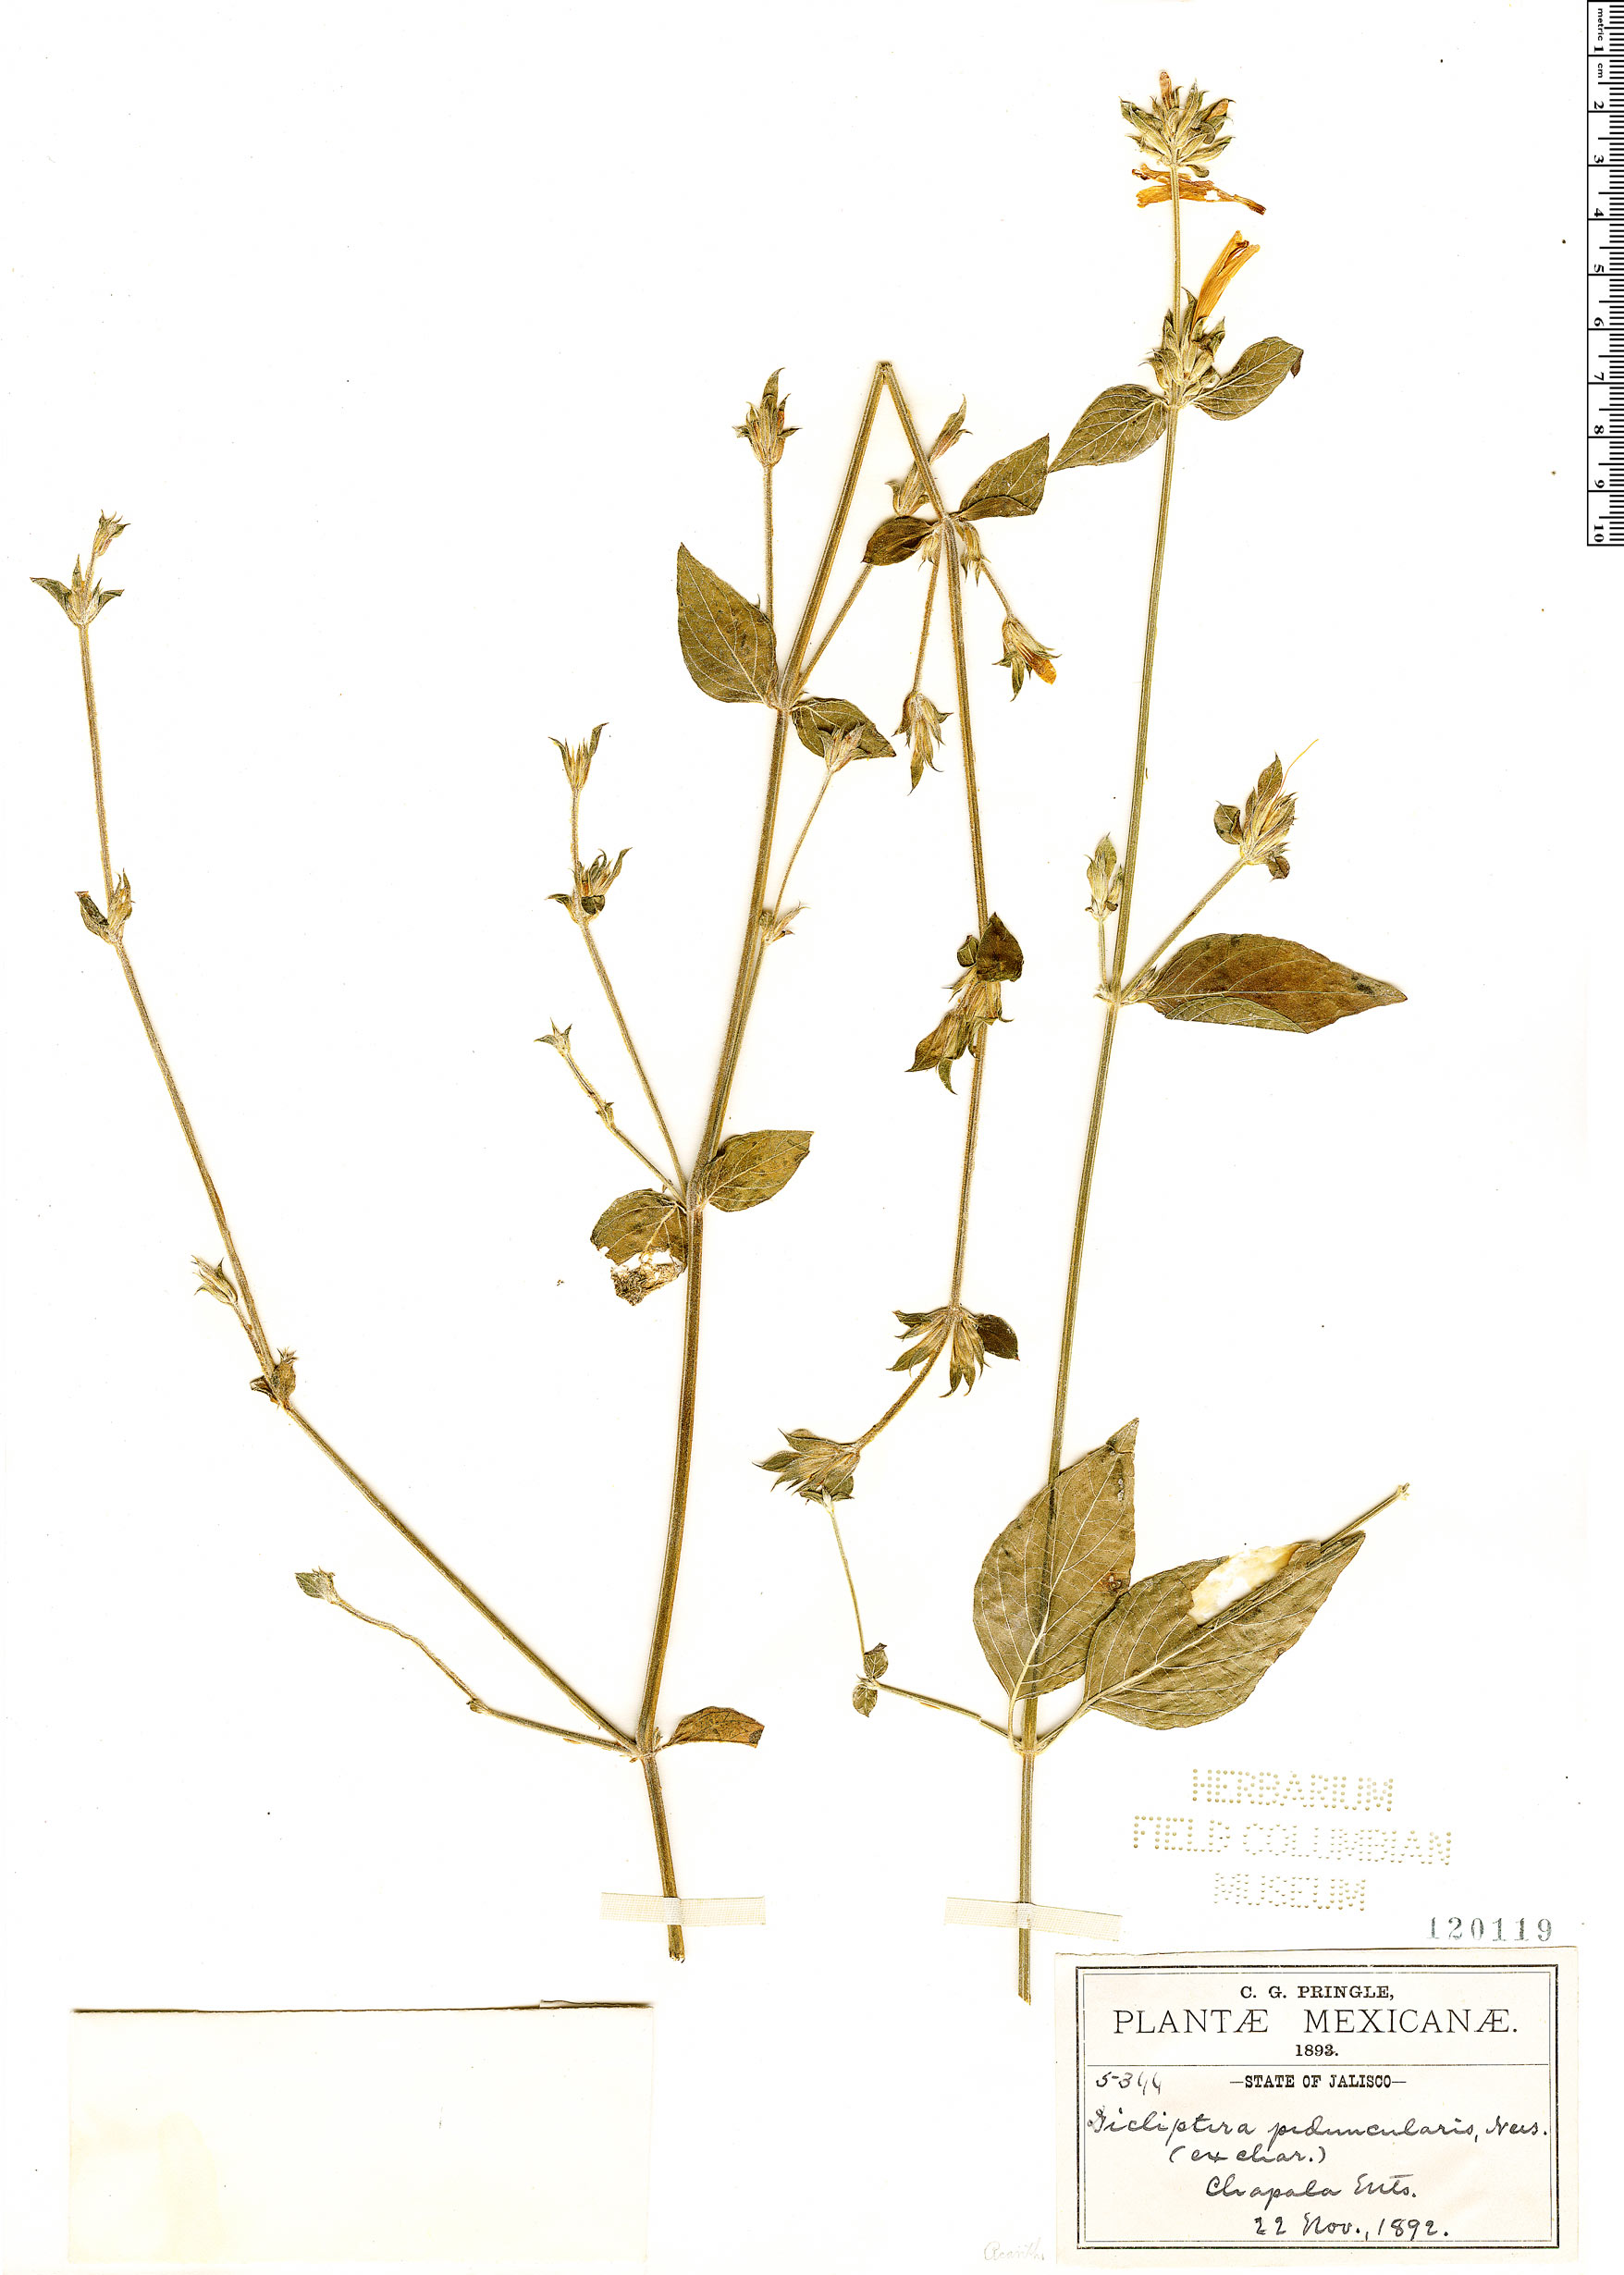 Espécimen: Dicliptera peduncularis